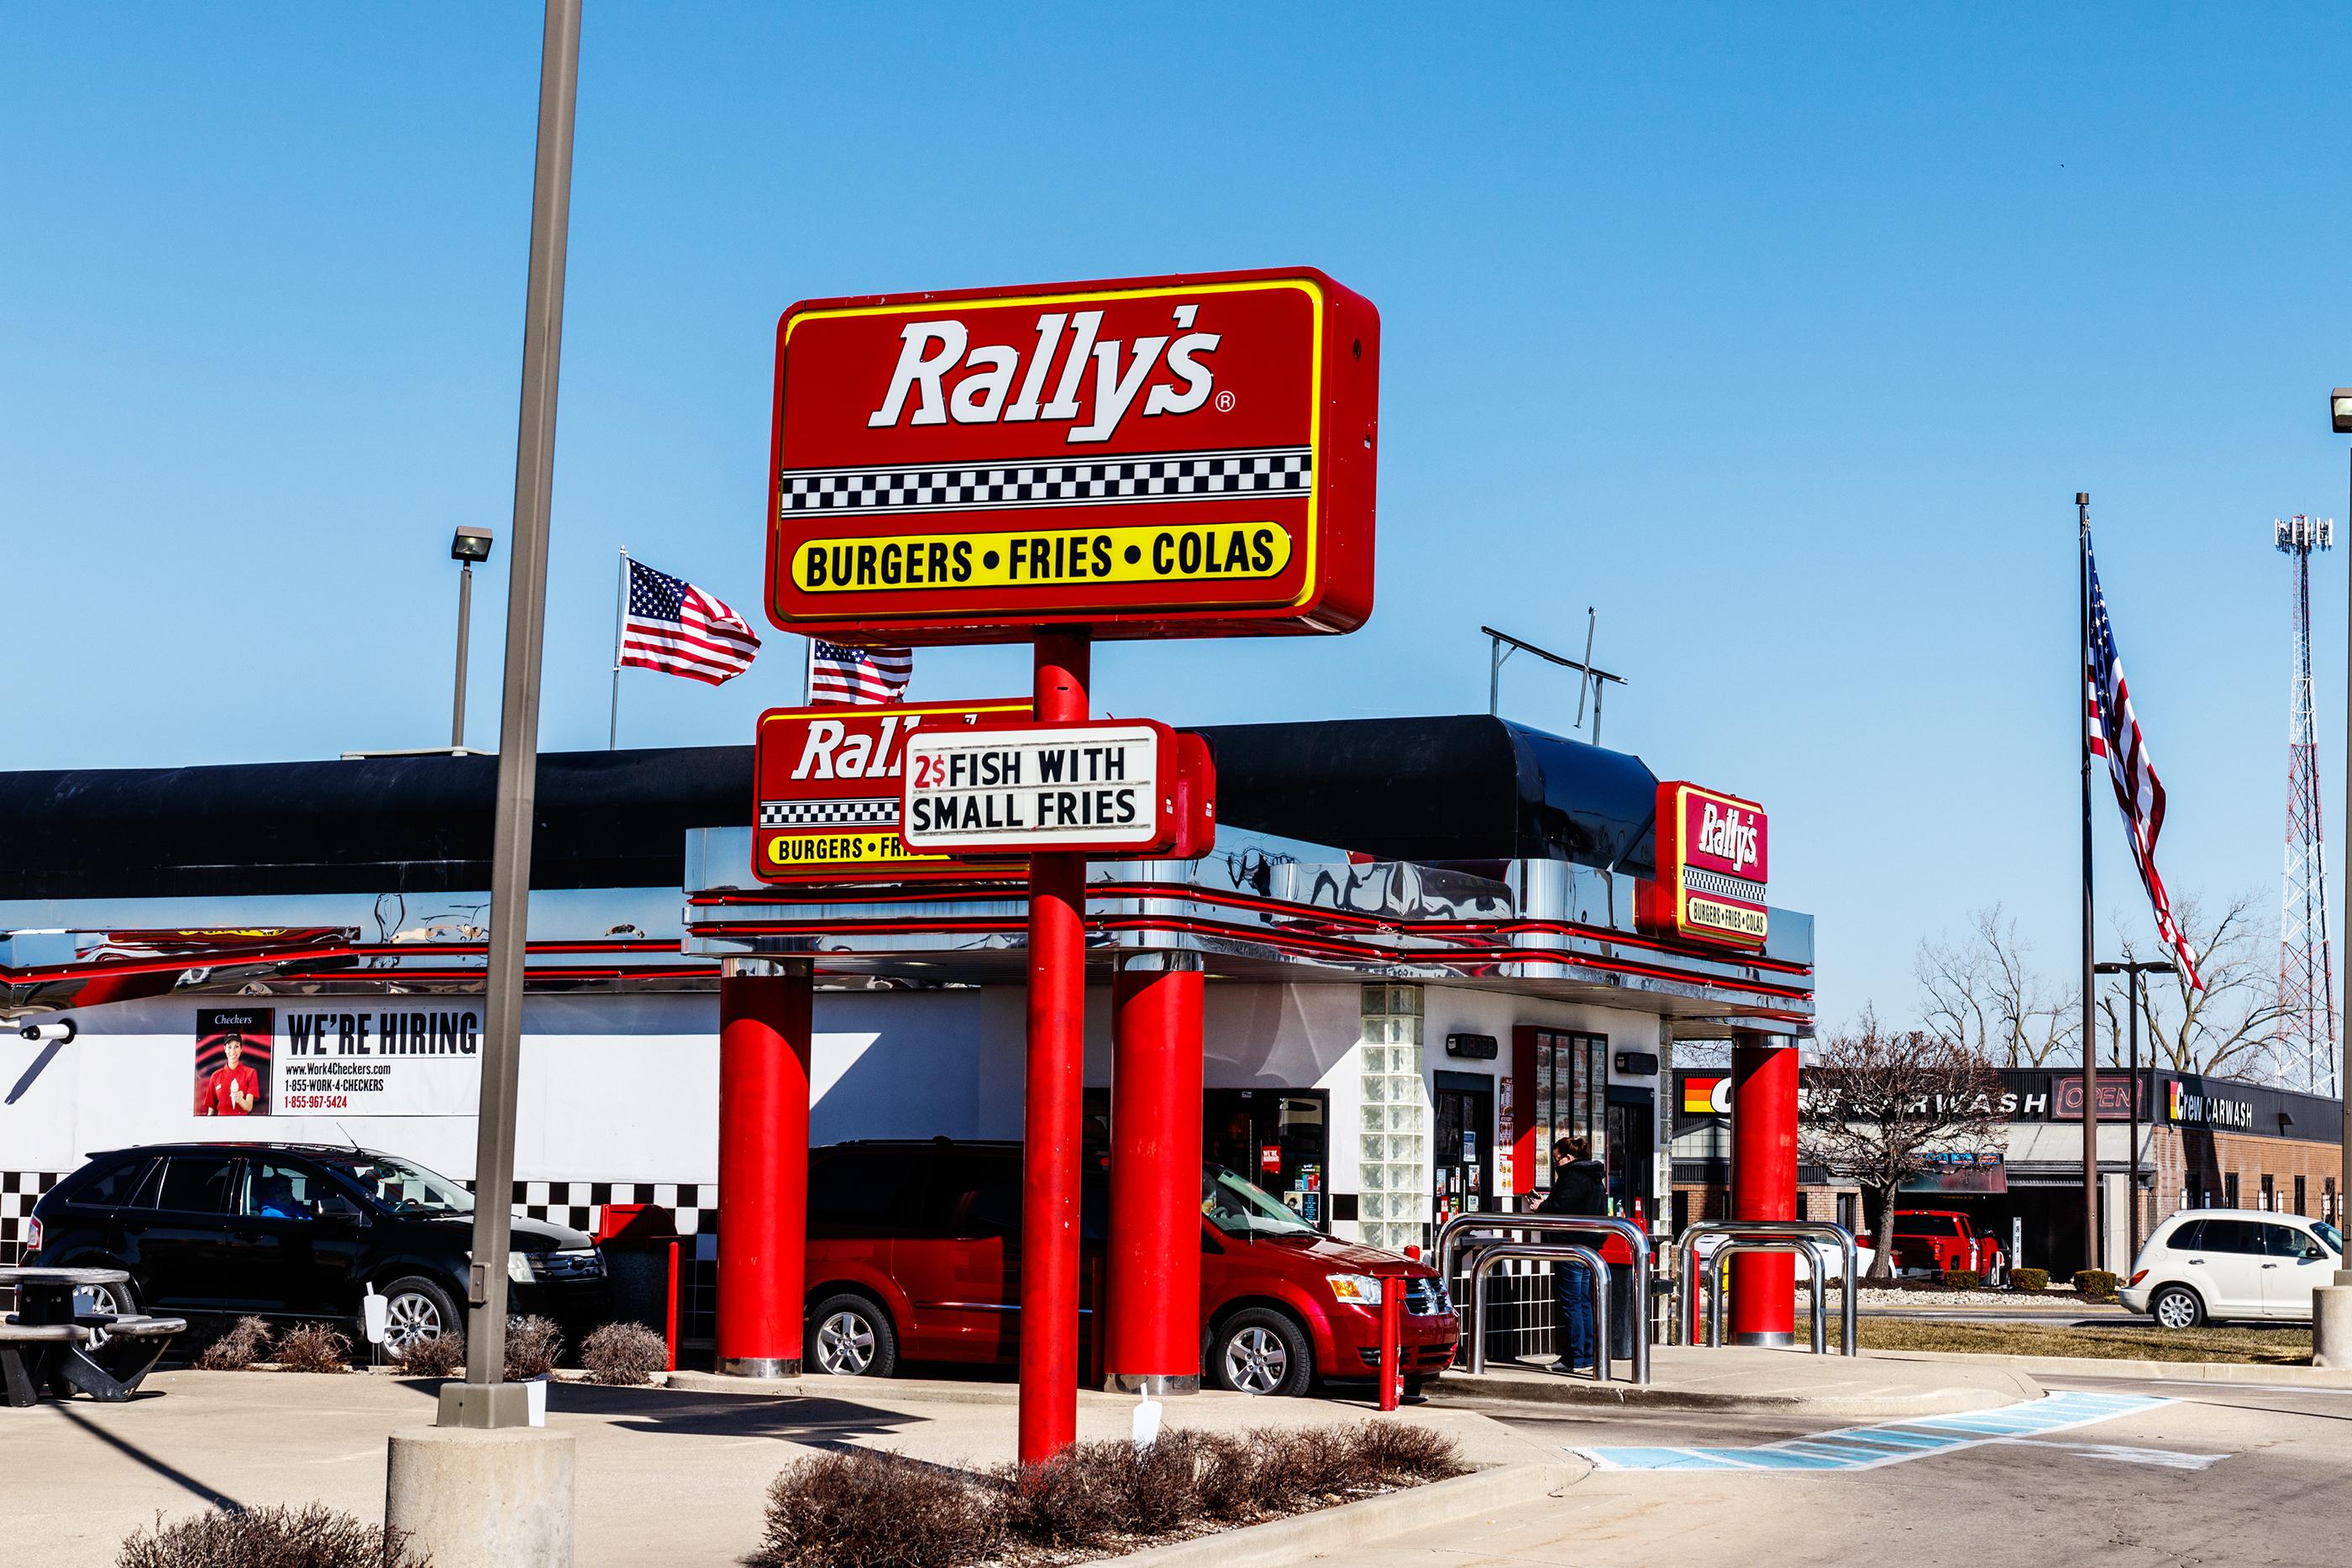 Local Rally's Drive Thru fast food restaurant, Kokomo, March 2018.